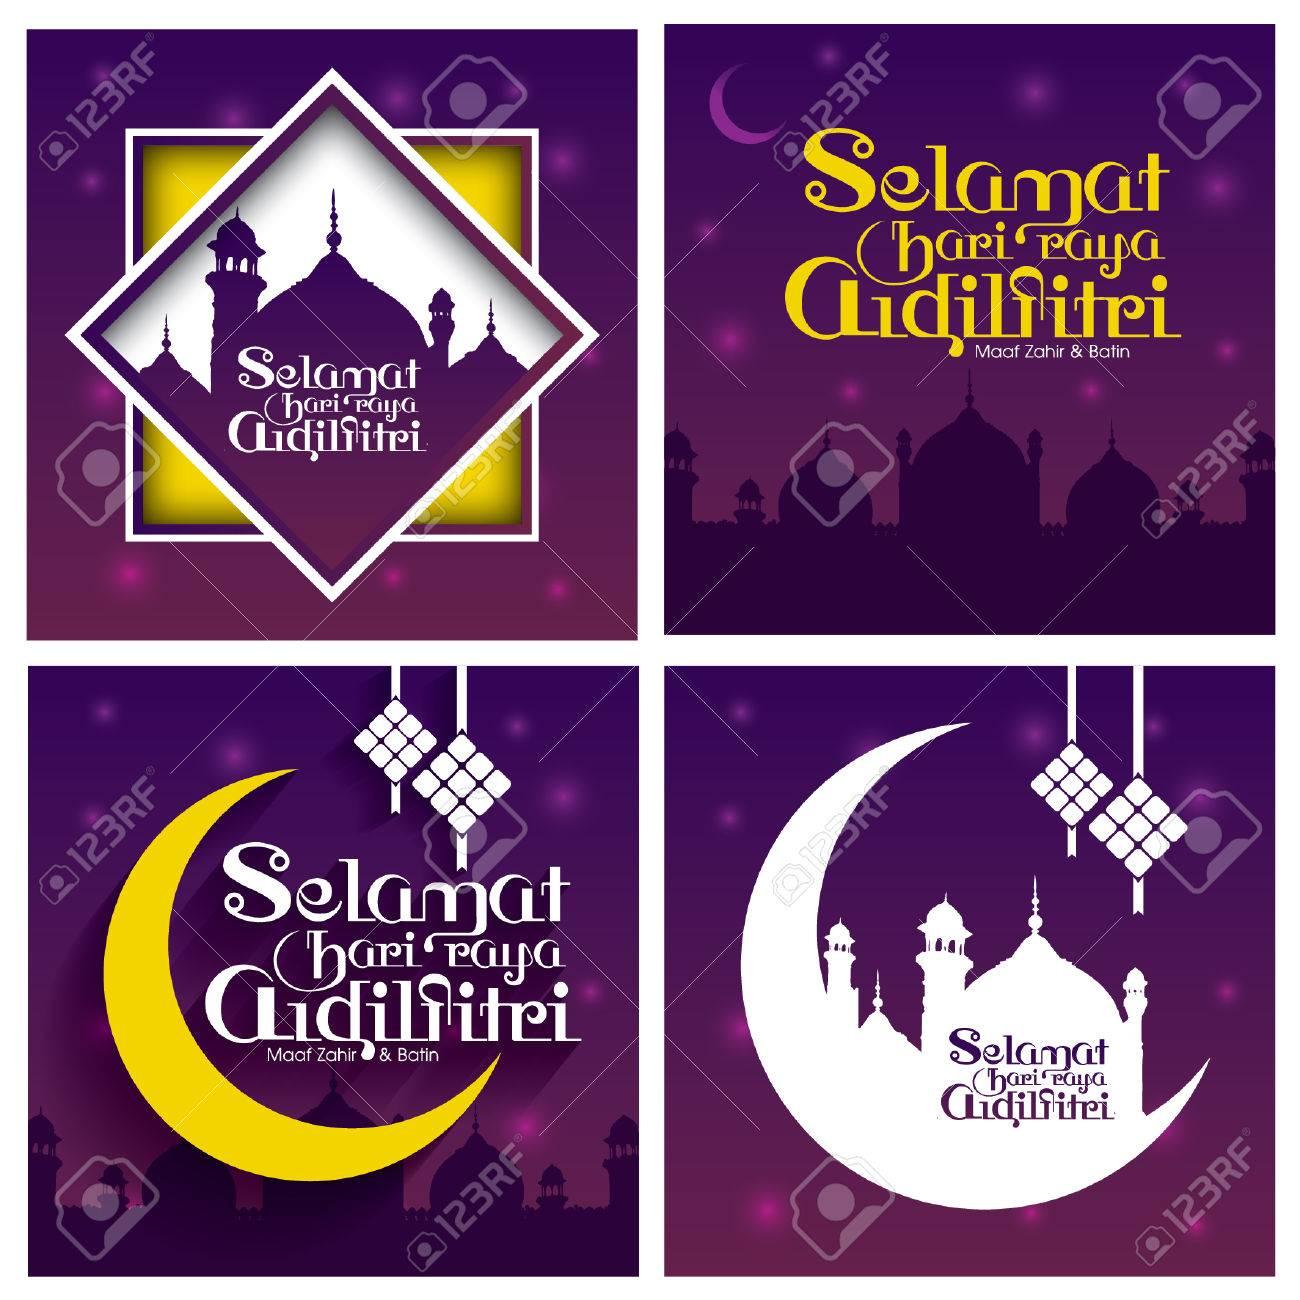 4 Set of Selamat Hari Raya Aidilfitri Vector Design (Translation: Celebration of Breaking Fast) - 77669934